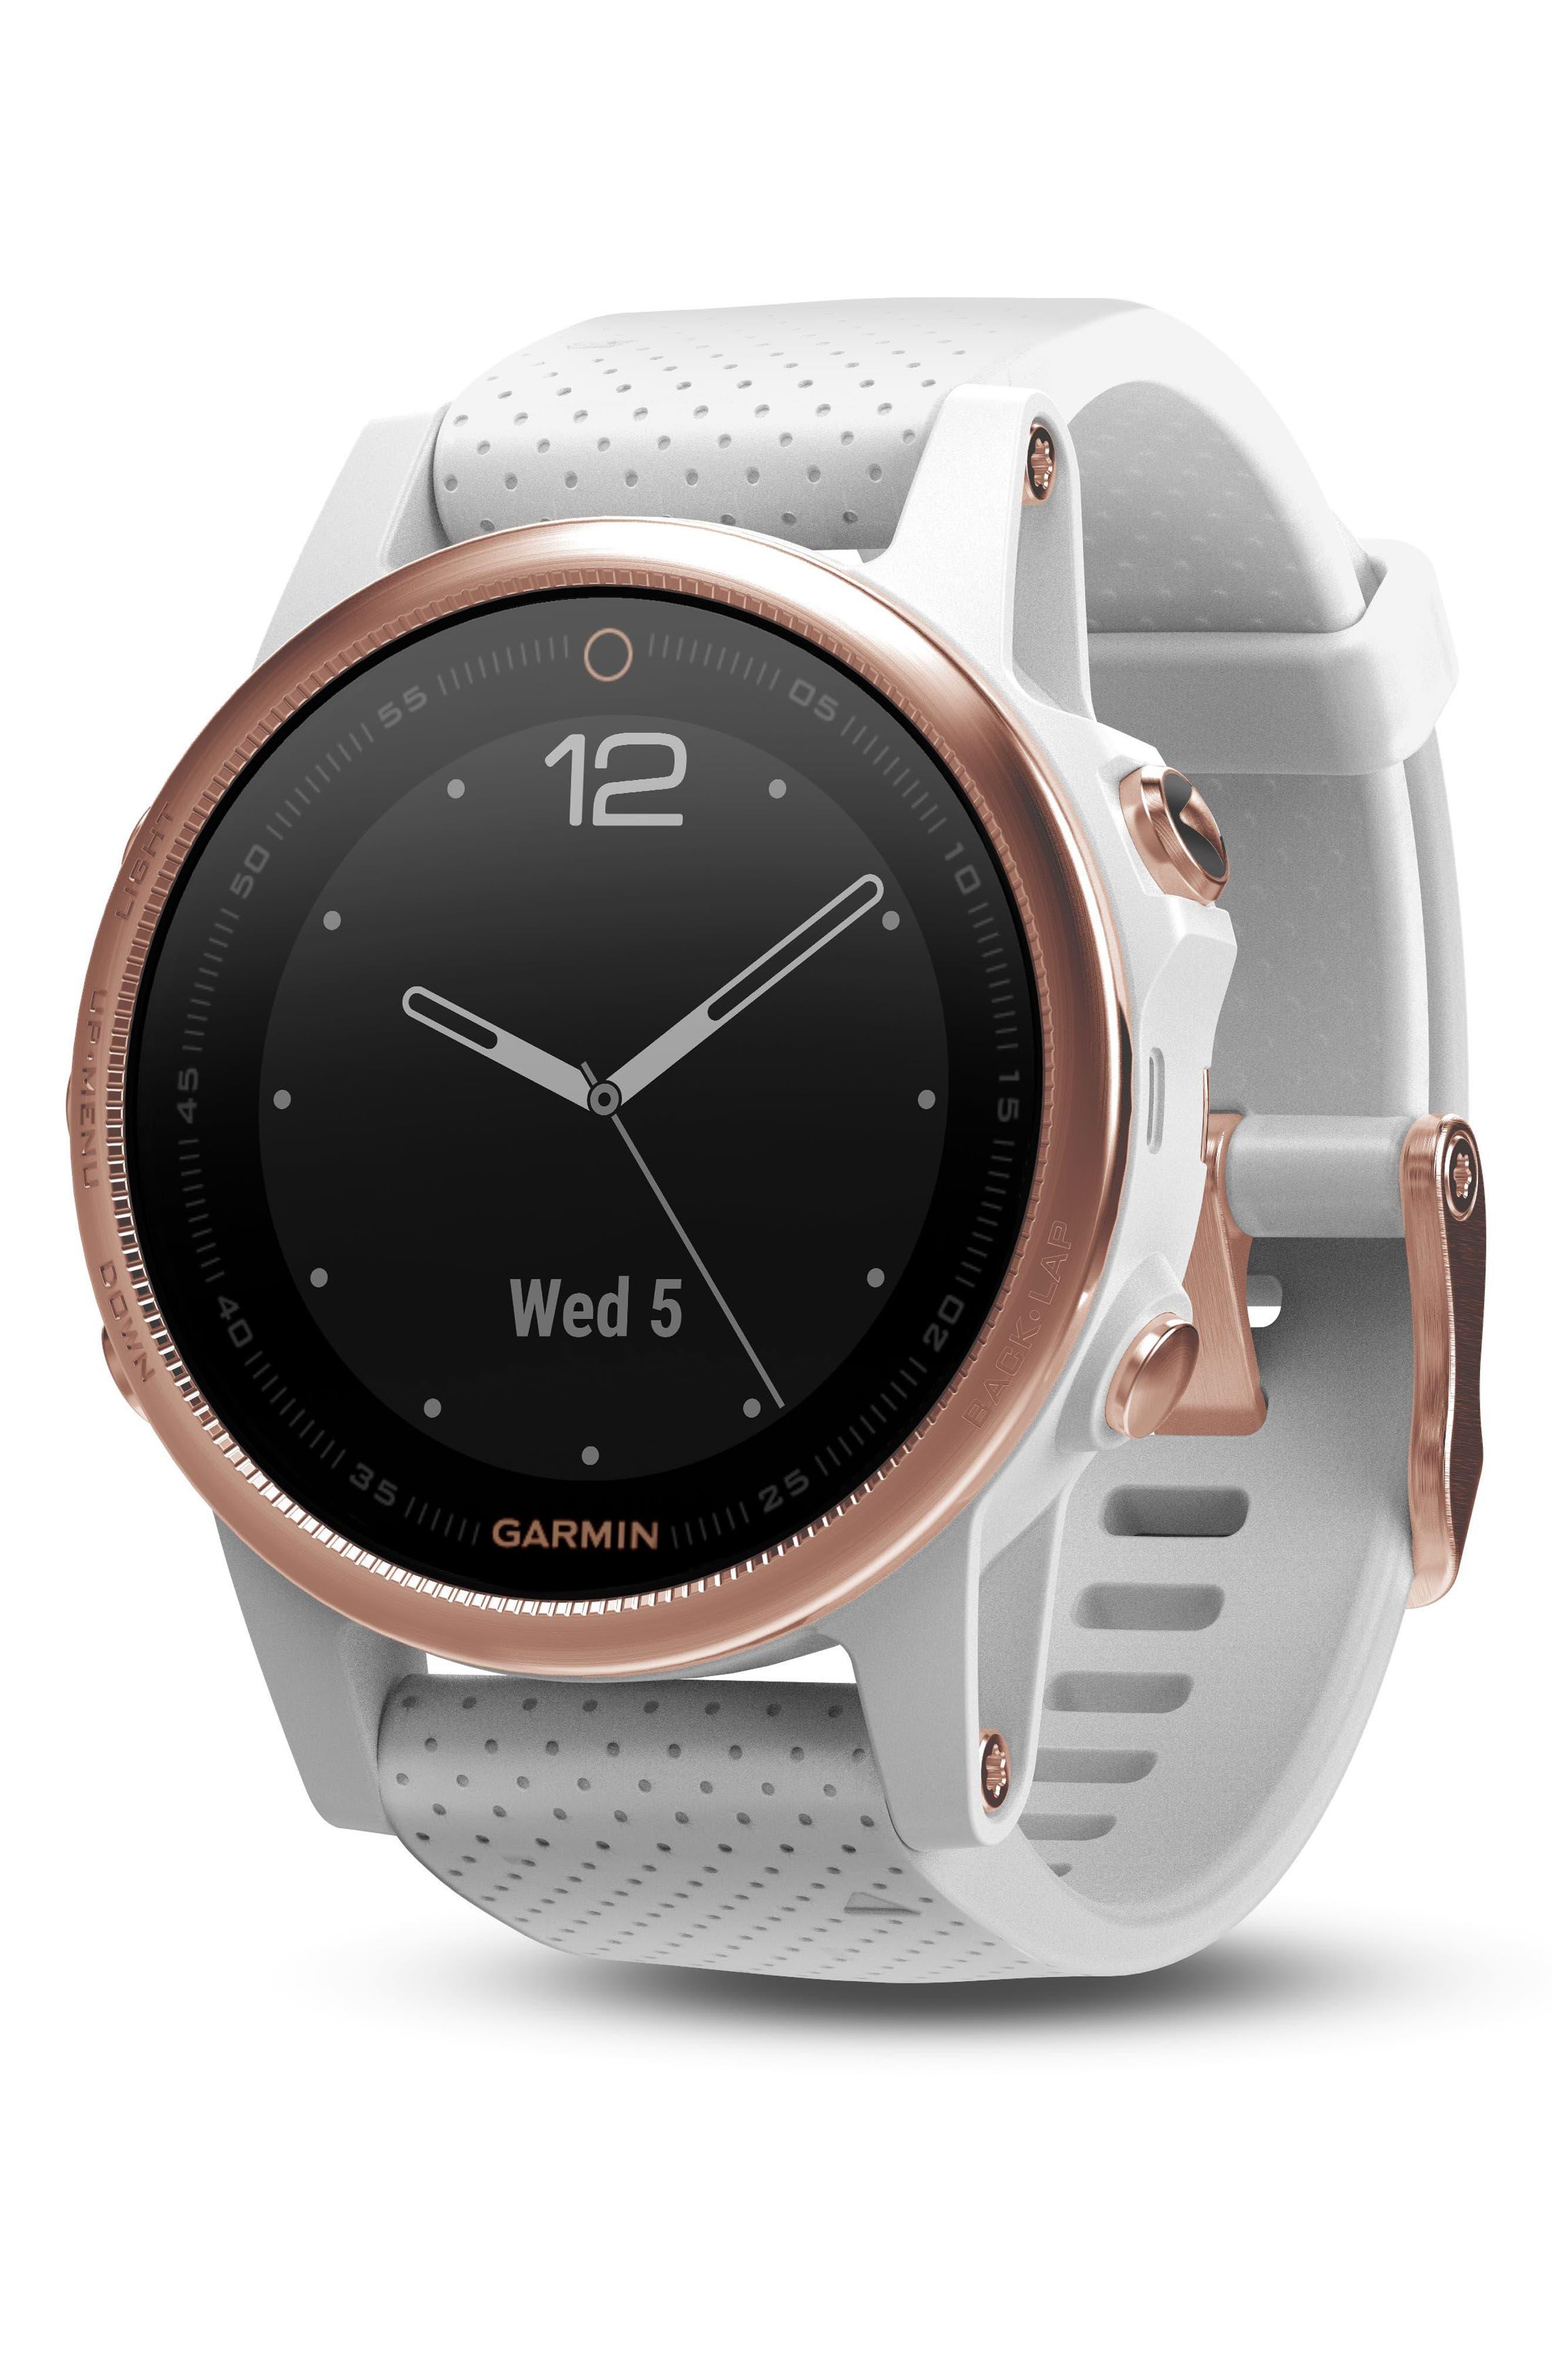 fenix<sup>®</sup> 5S Sapphire Premium Multisport GPS Watch, 42mm,                         Main,                         color, White/ Rose Gold Sapphire